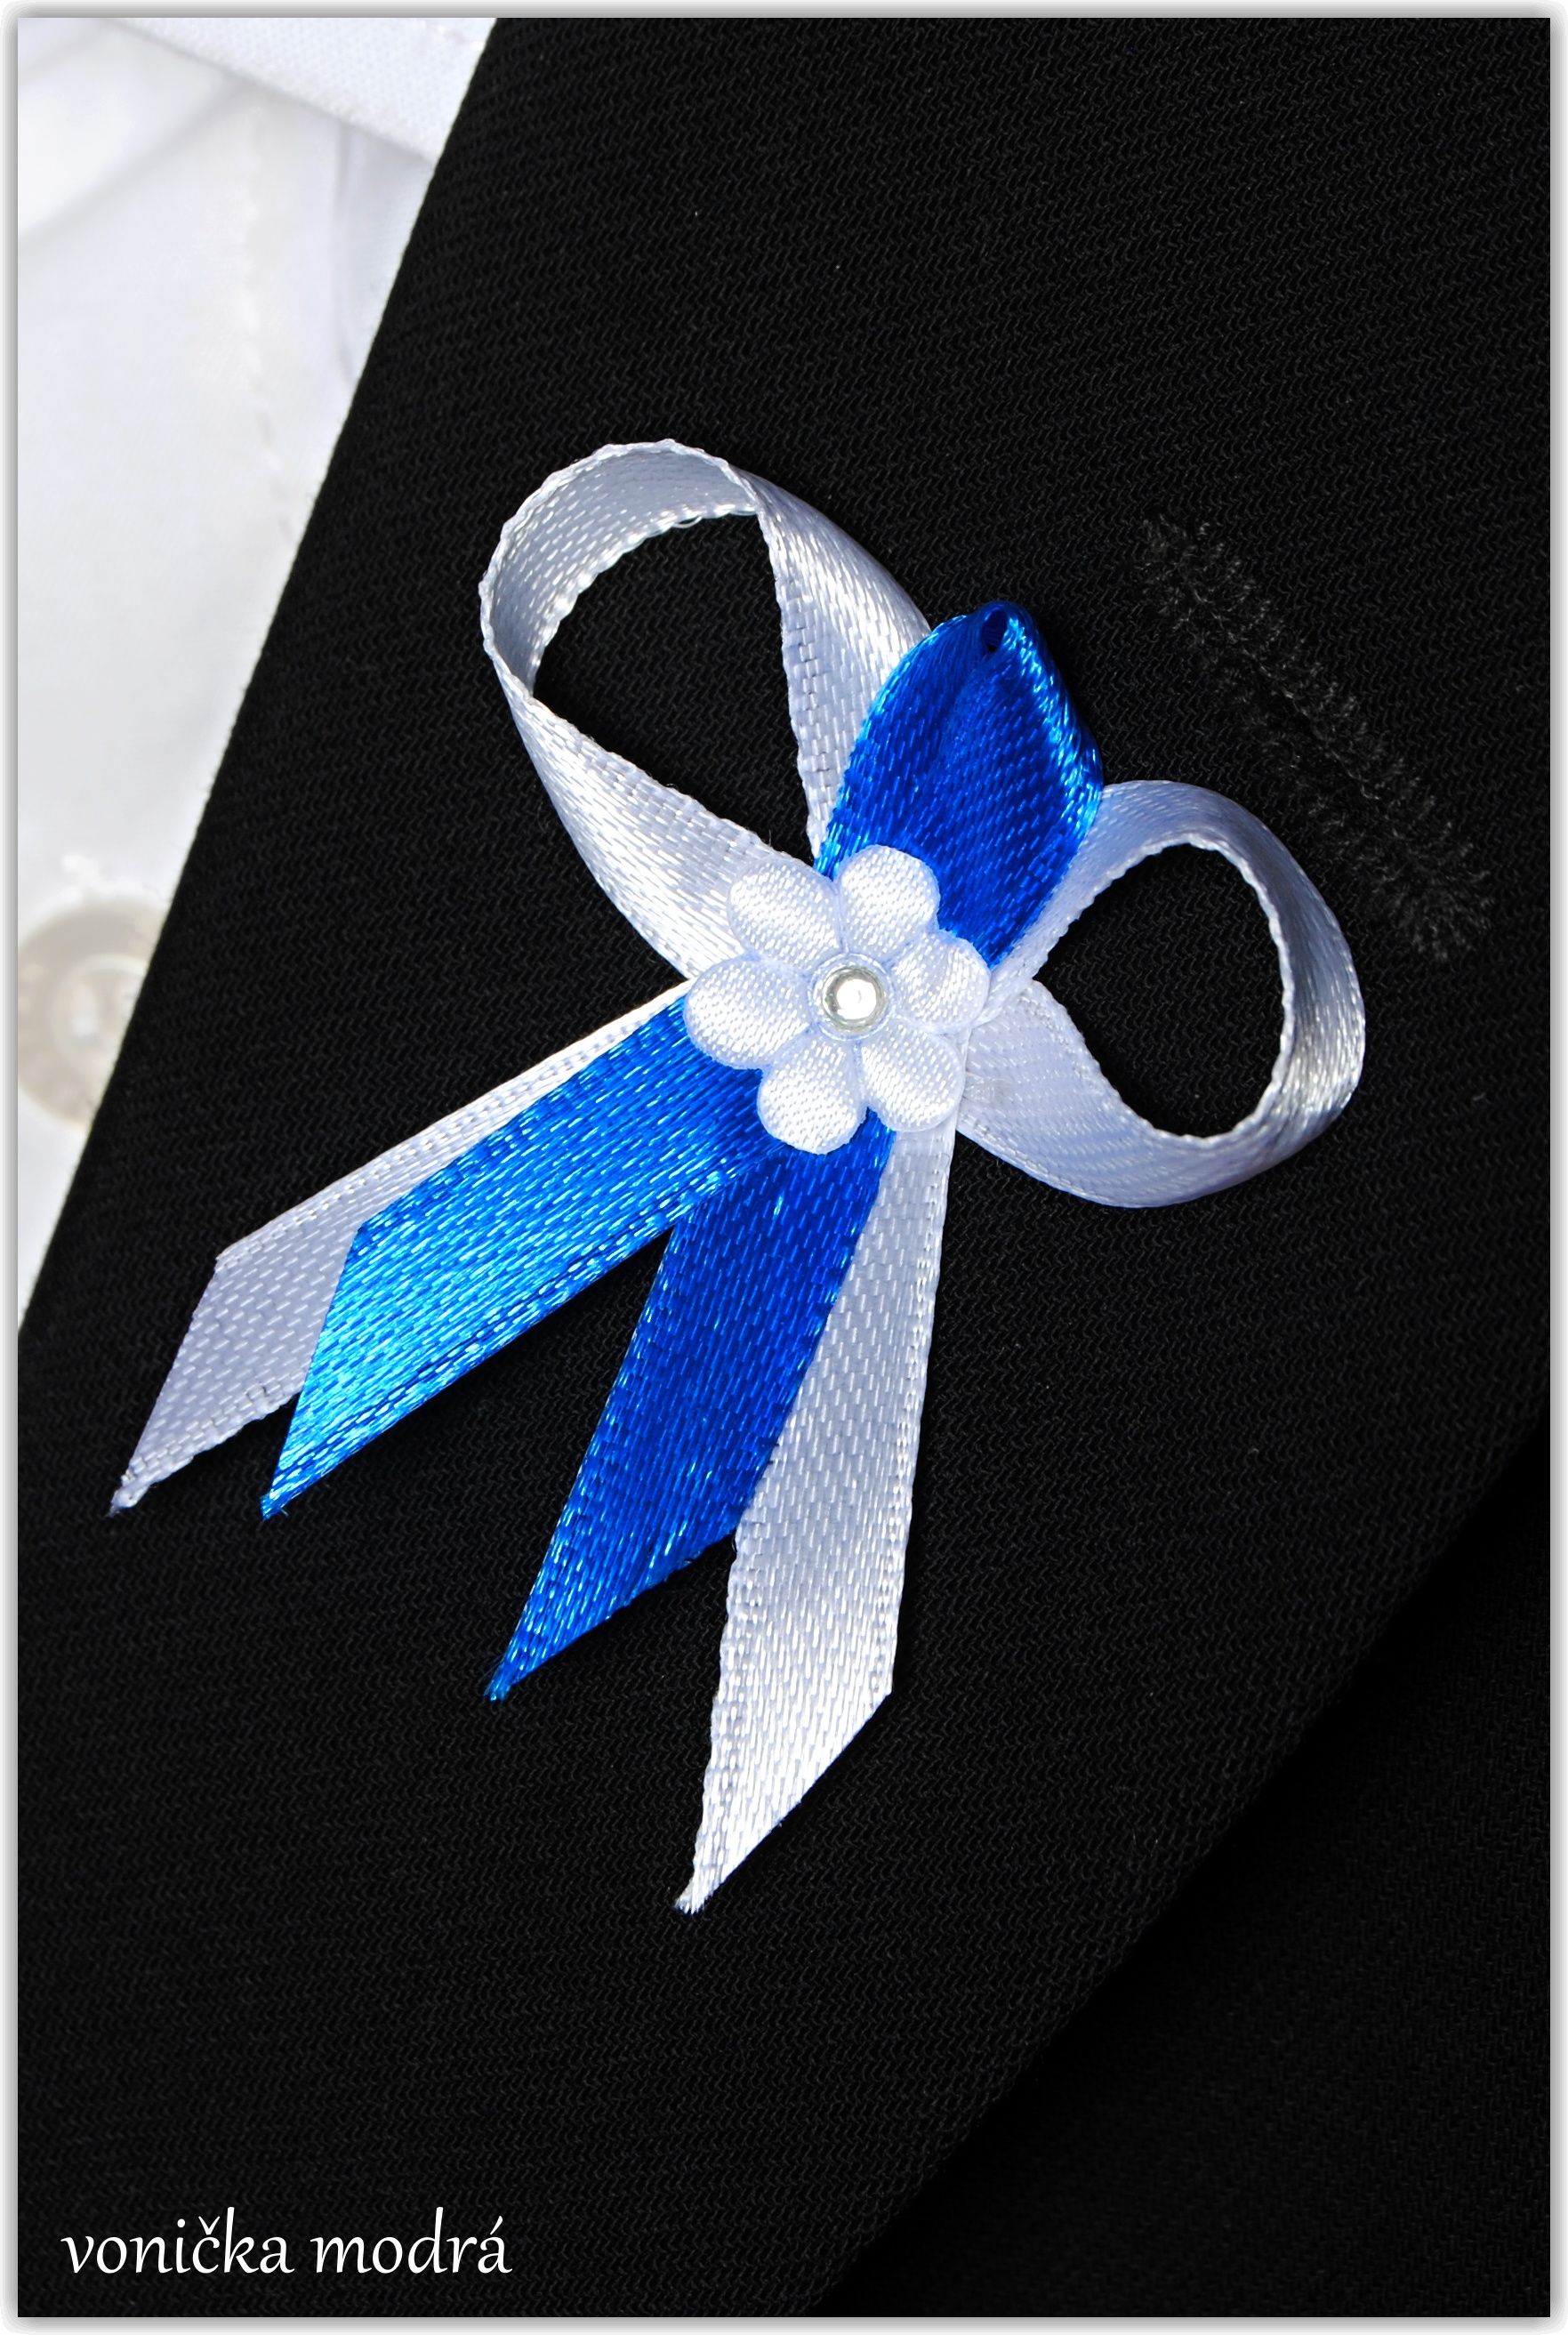 Svatebni Maslicka Mala Ladena Do Bilo Modre Barvy Dekorace A Doplnky